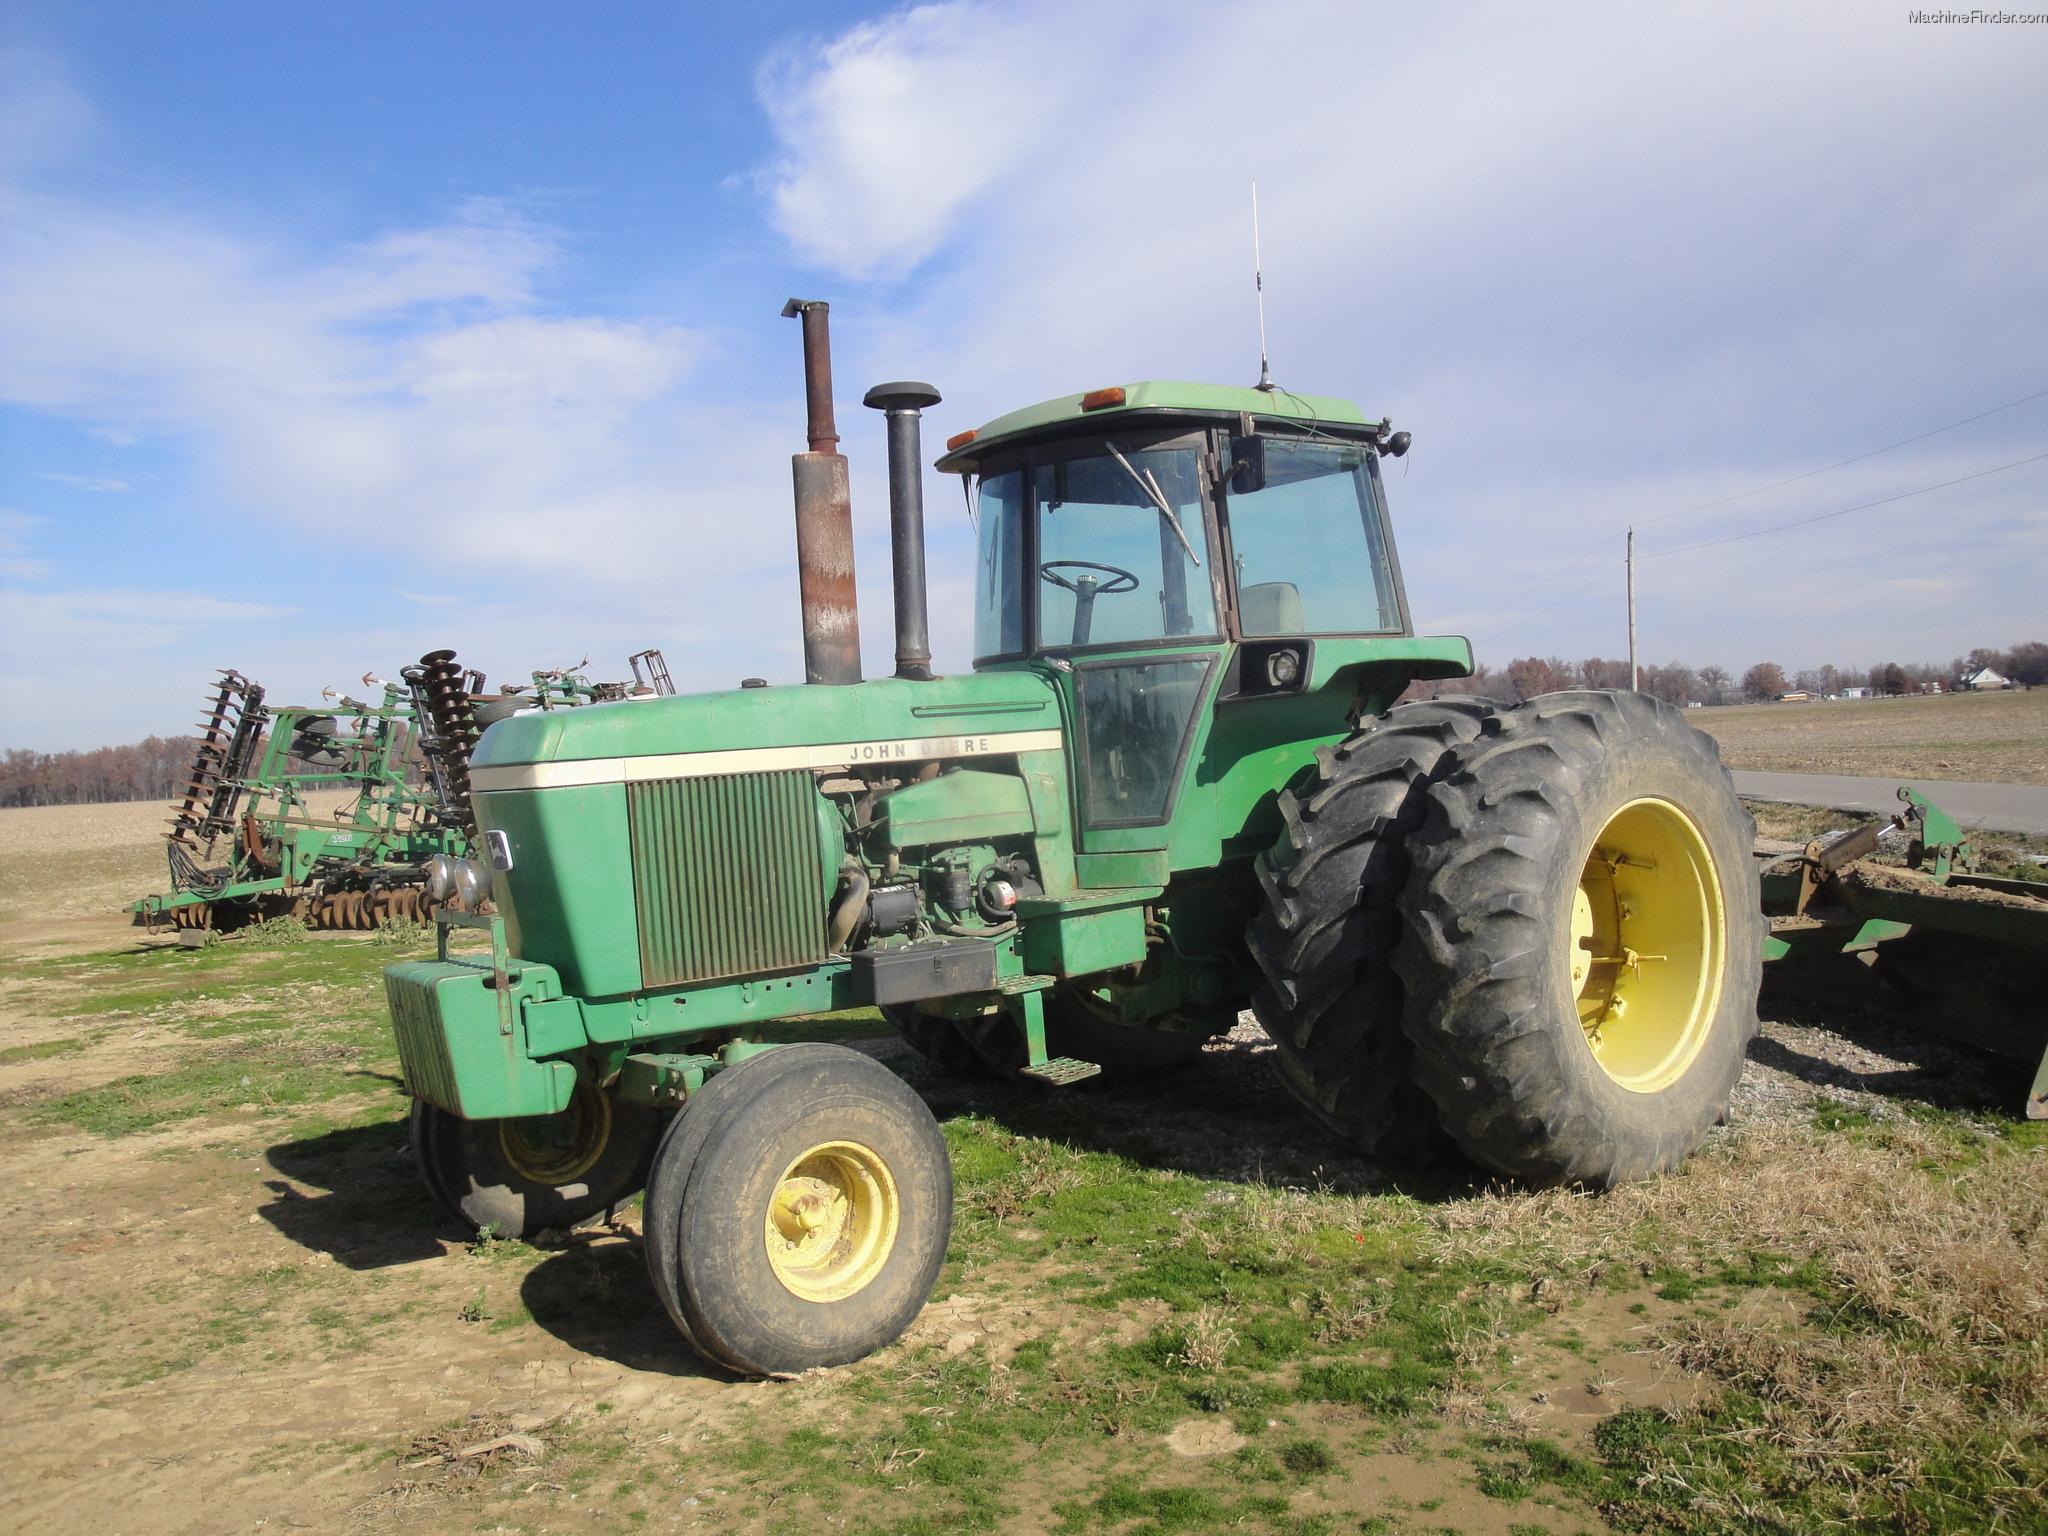 John Deere 4630 Tractor More Tractors Wiring Harness Parts For Farm Equipment